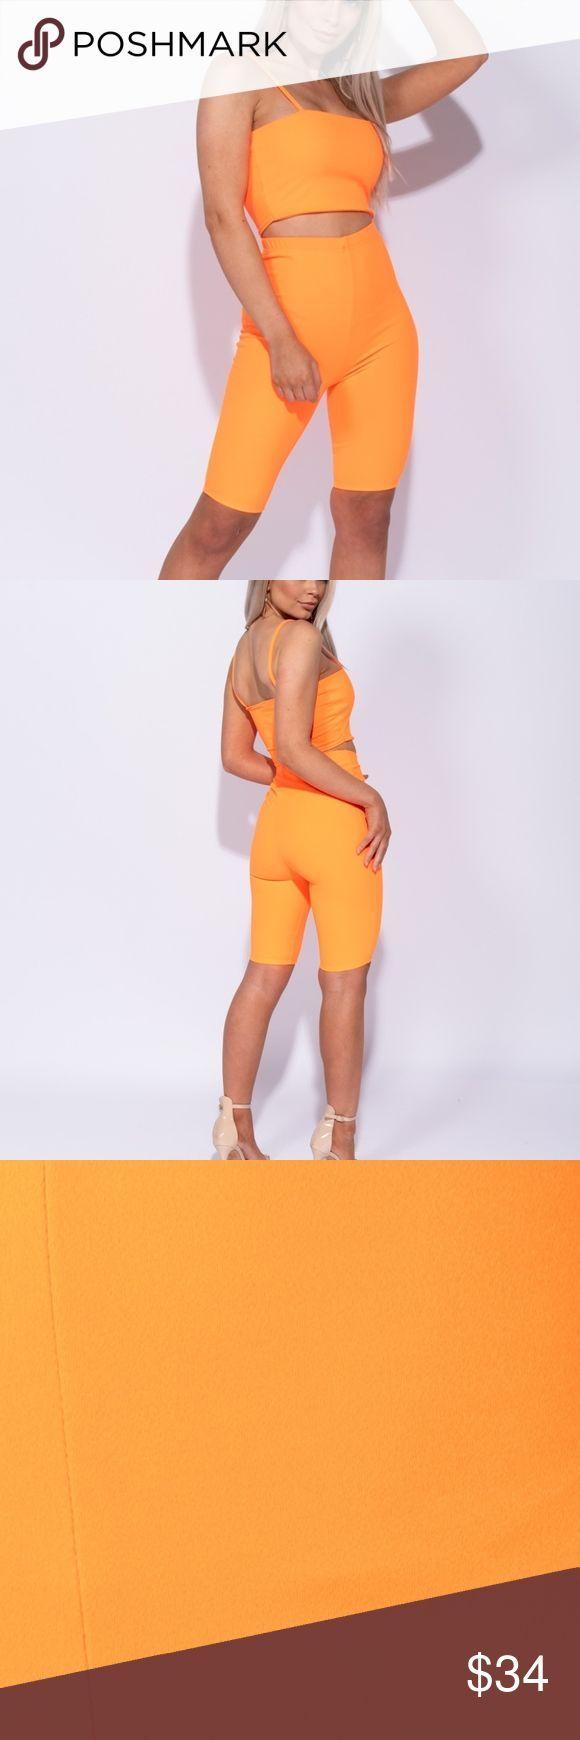 Neon Orange High Waist Stretchy Biker Shorts Your summer wardrobe will not be co…   – Biker Shorts